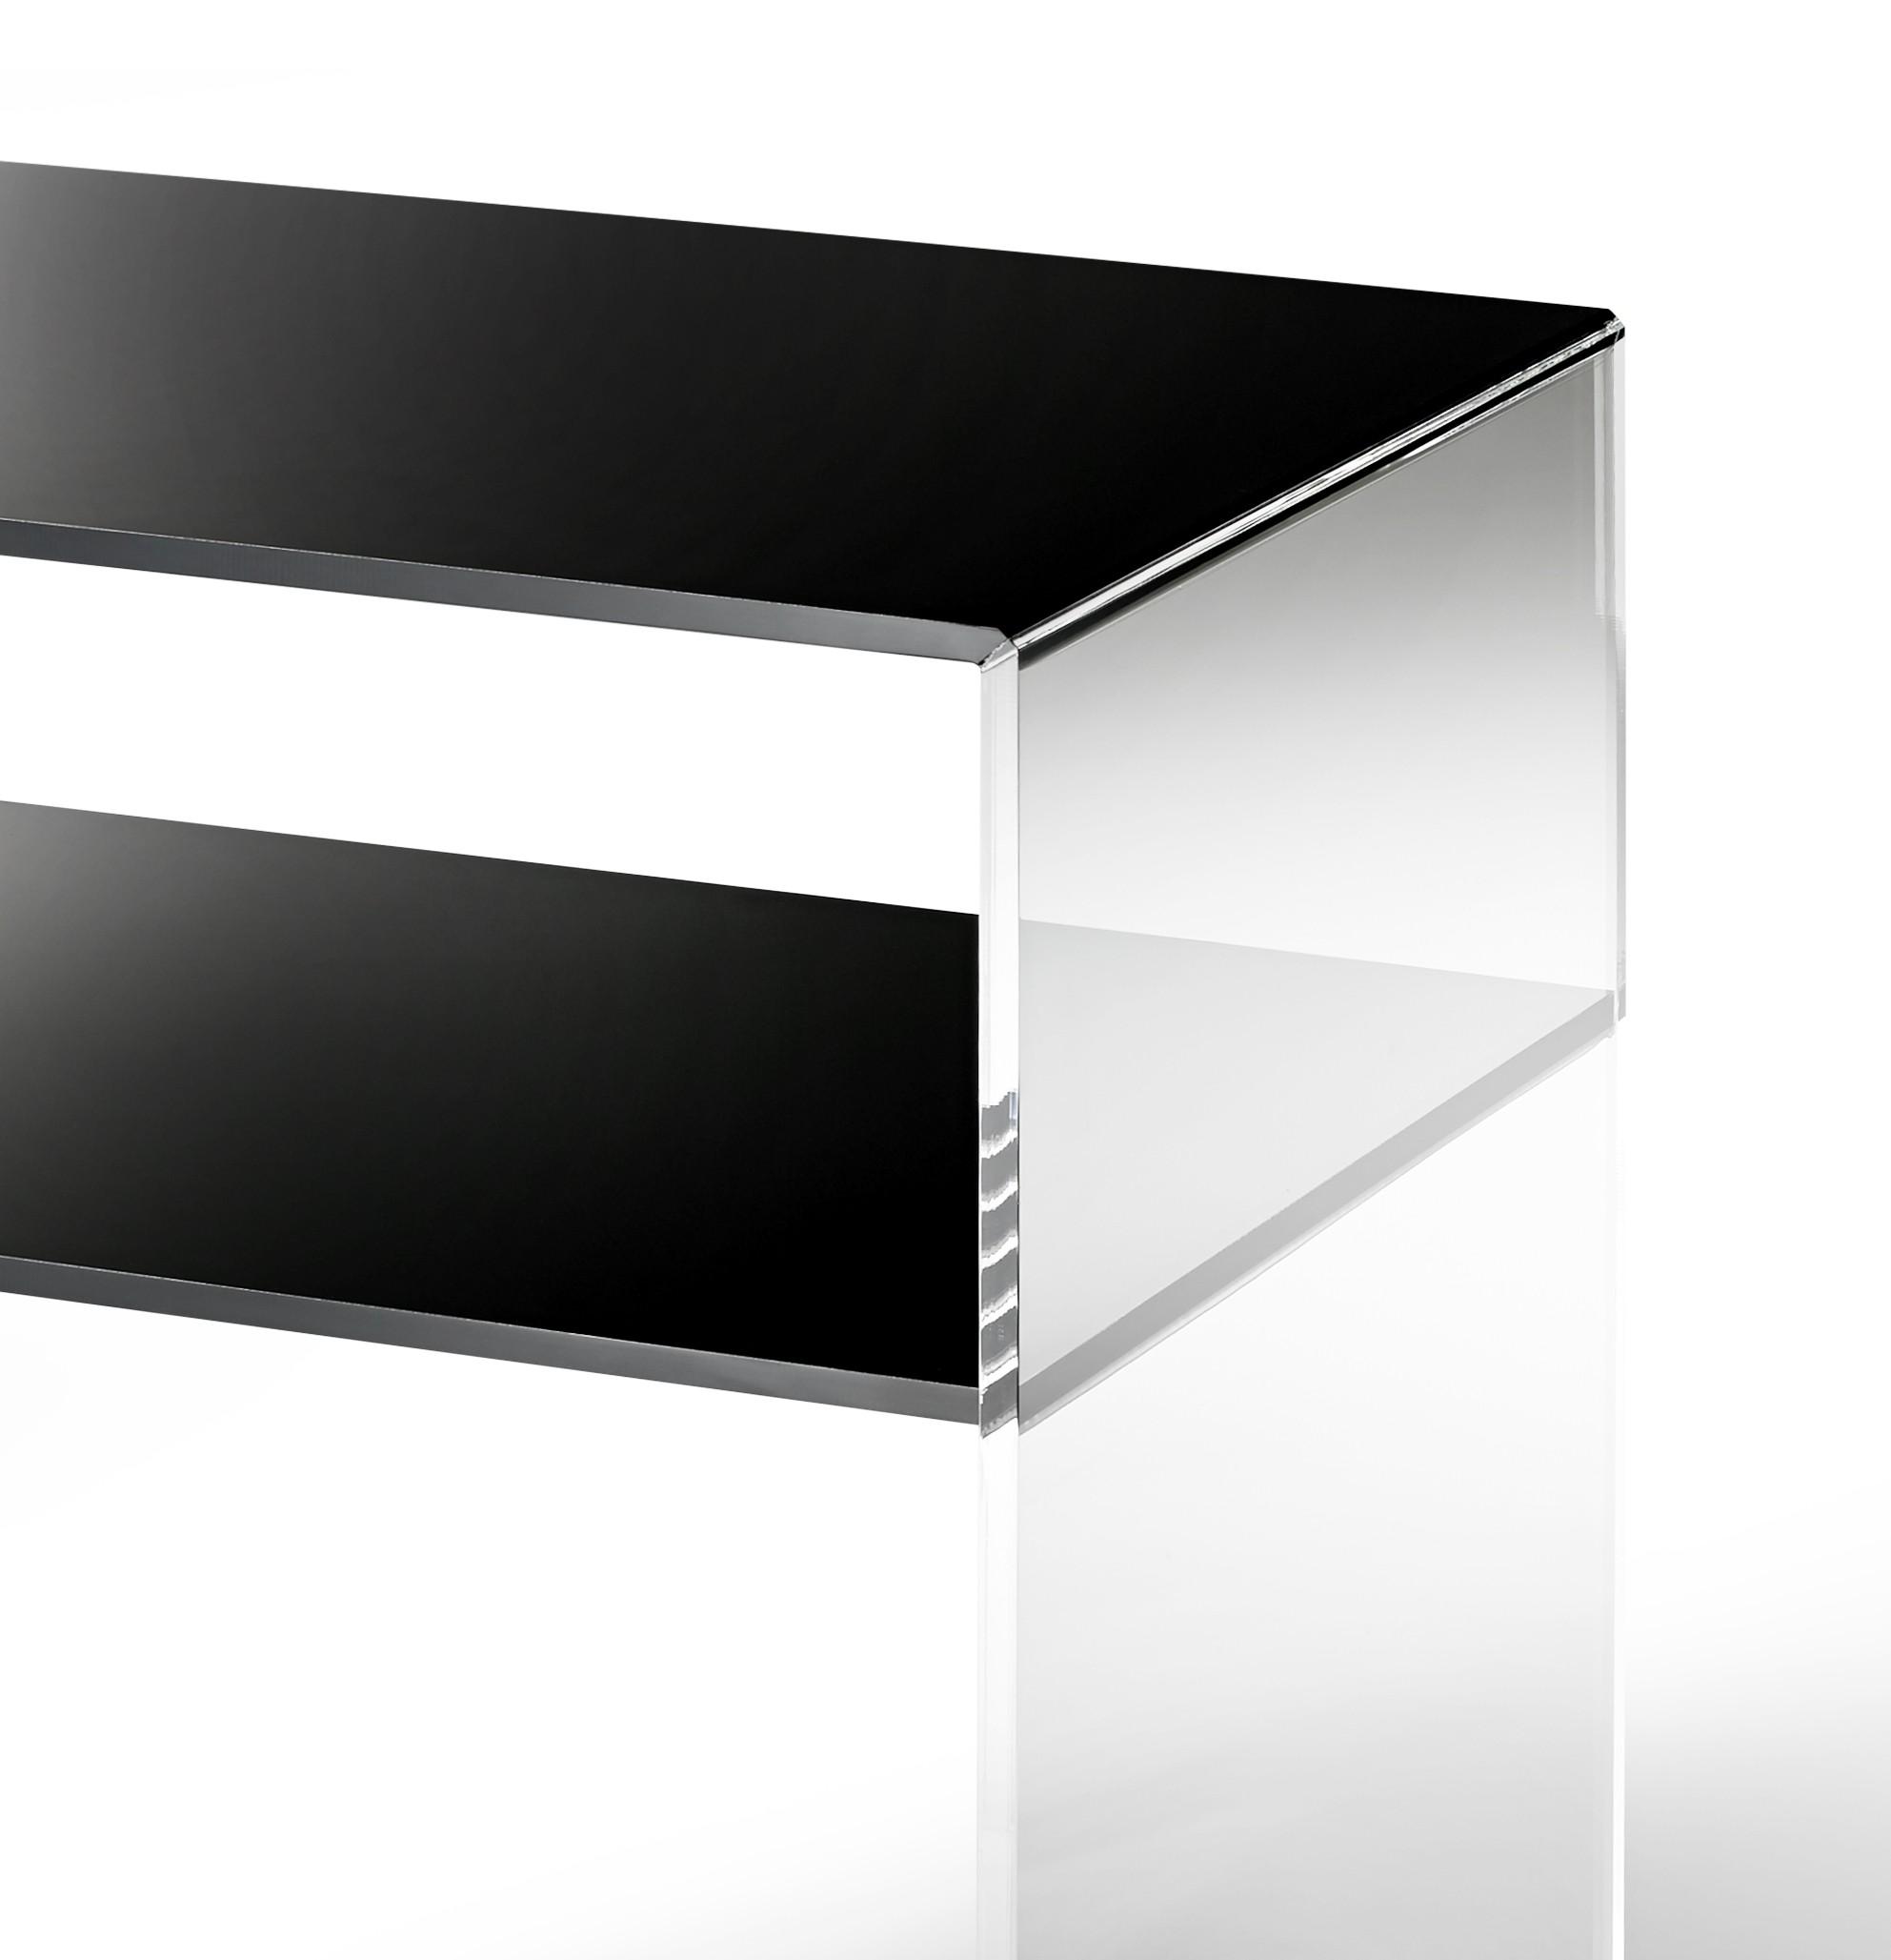 konsole las vegas breite 50 cm acrylglas schwarz wohnen las vegas. Black Bedroom Furniture Sets. Home Design Ideas